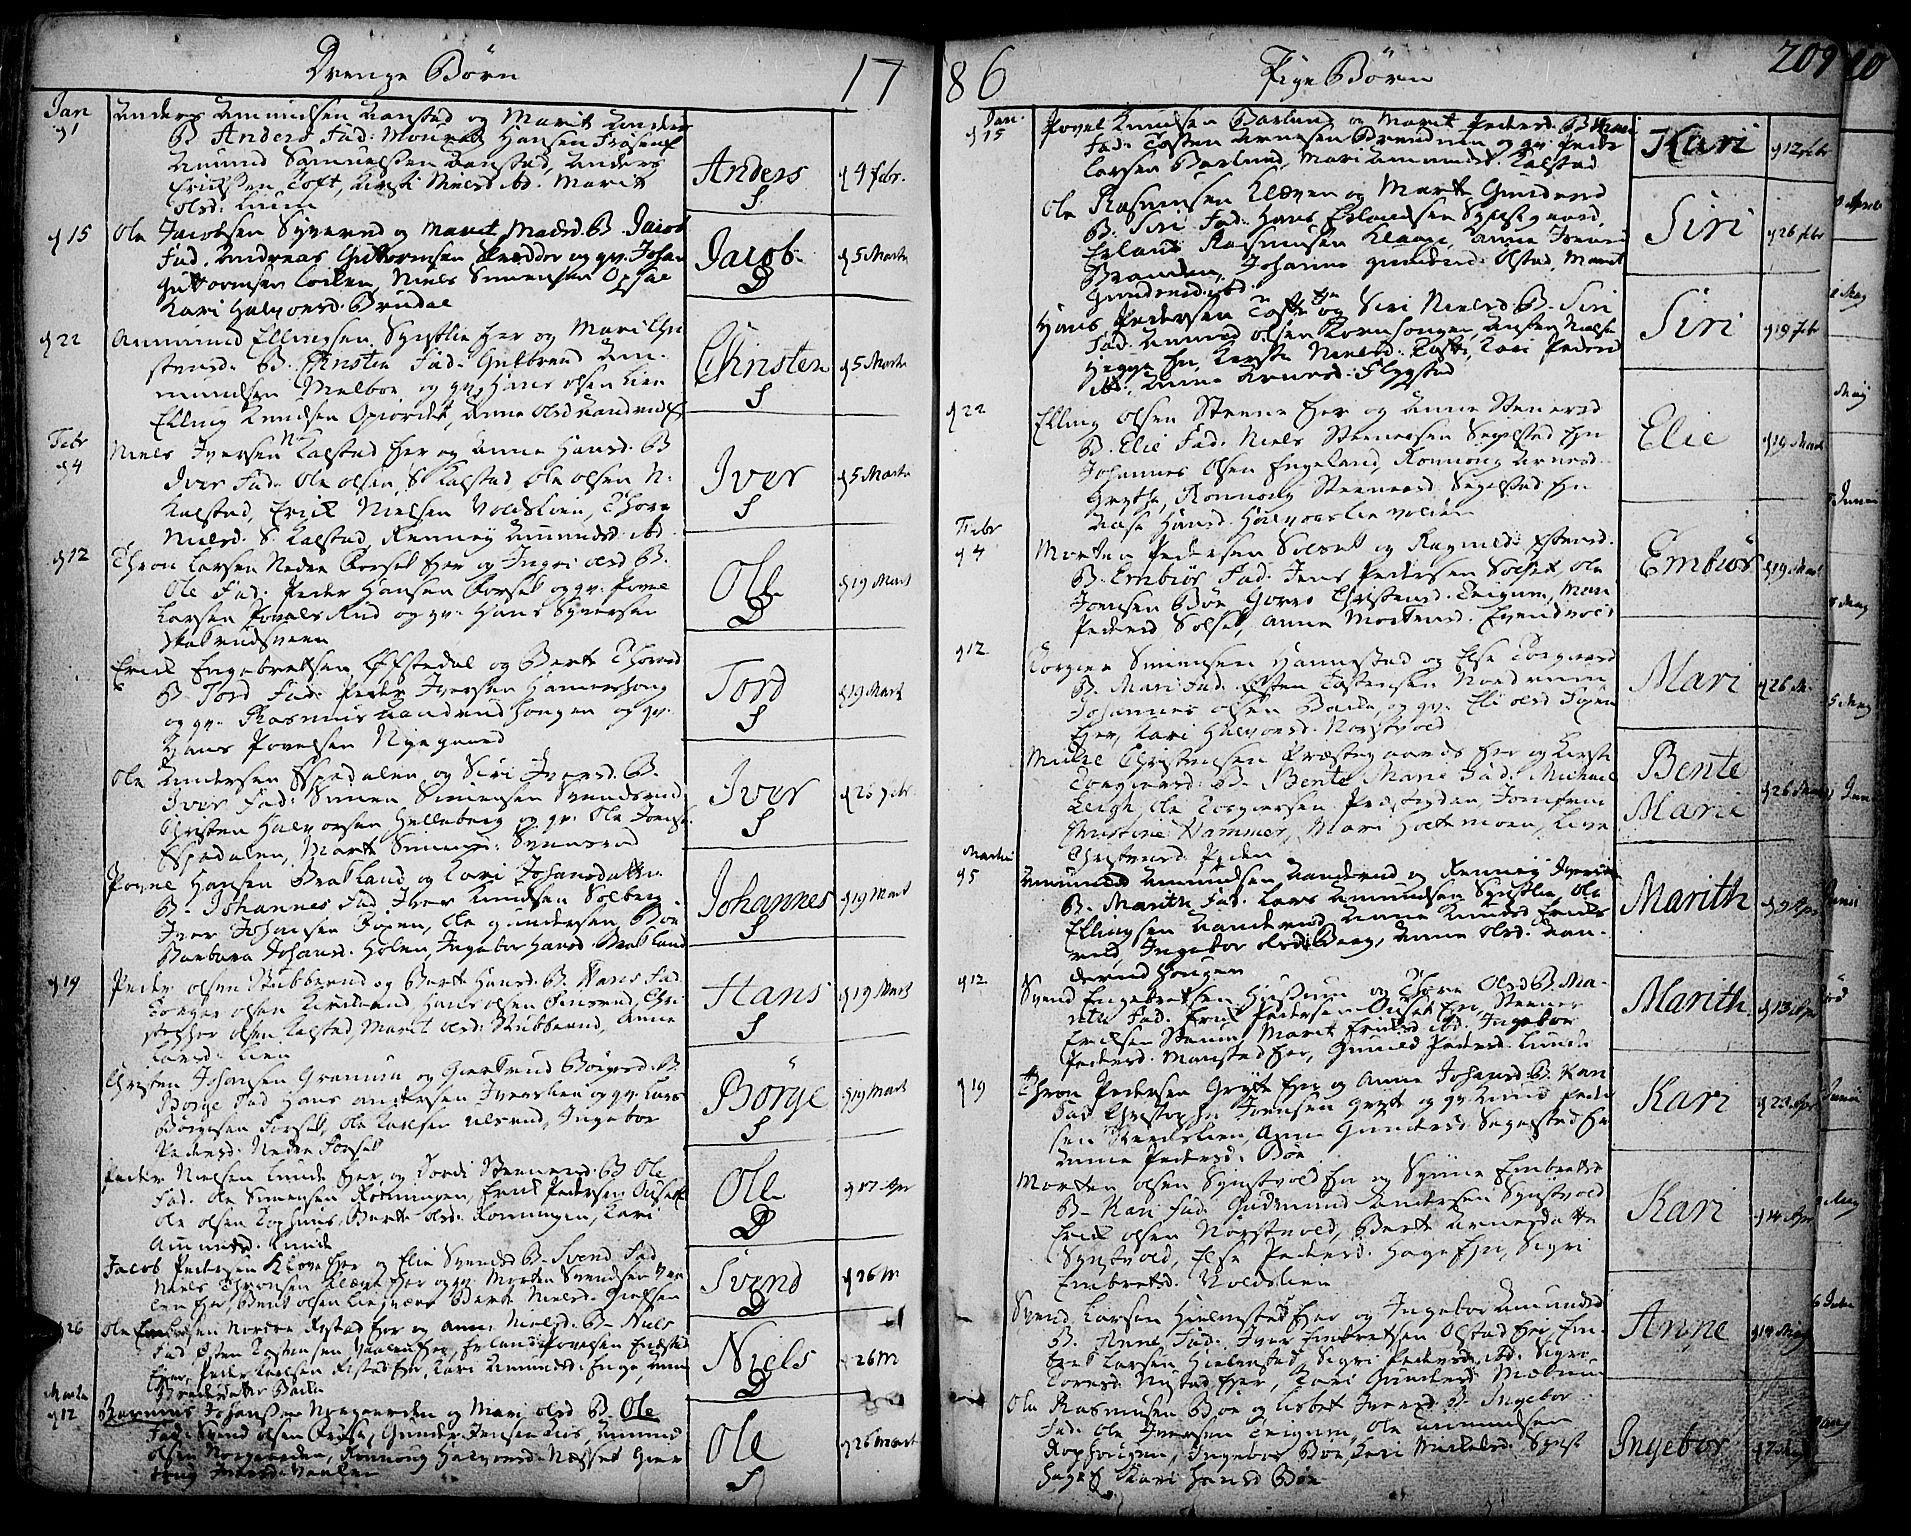 SAH, Gausdal prestekontor, Ministerialbok nr. 3, 1758-1809, s. 209